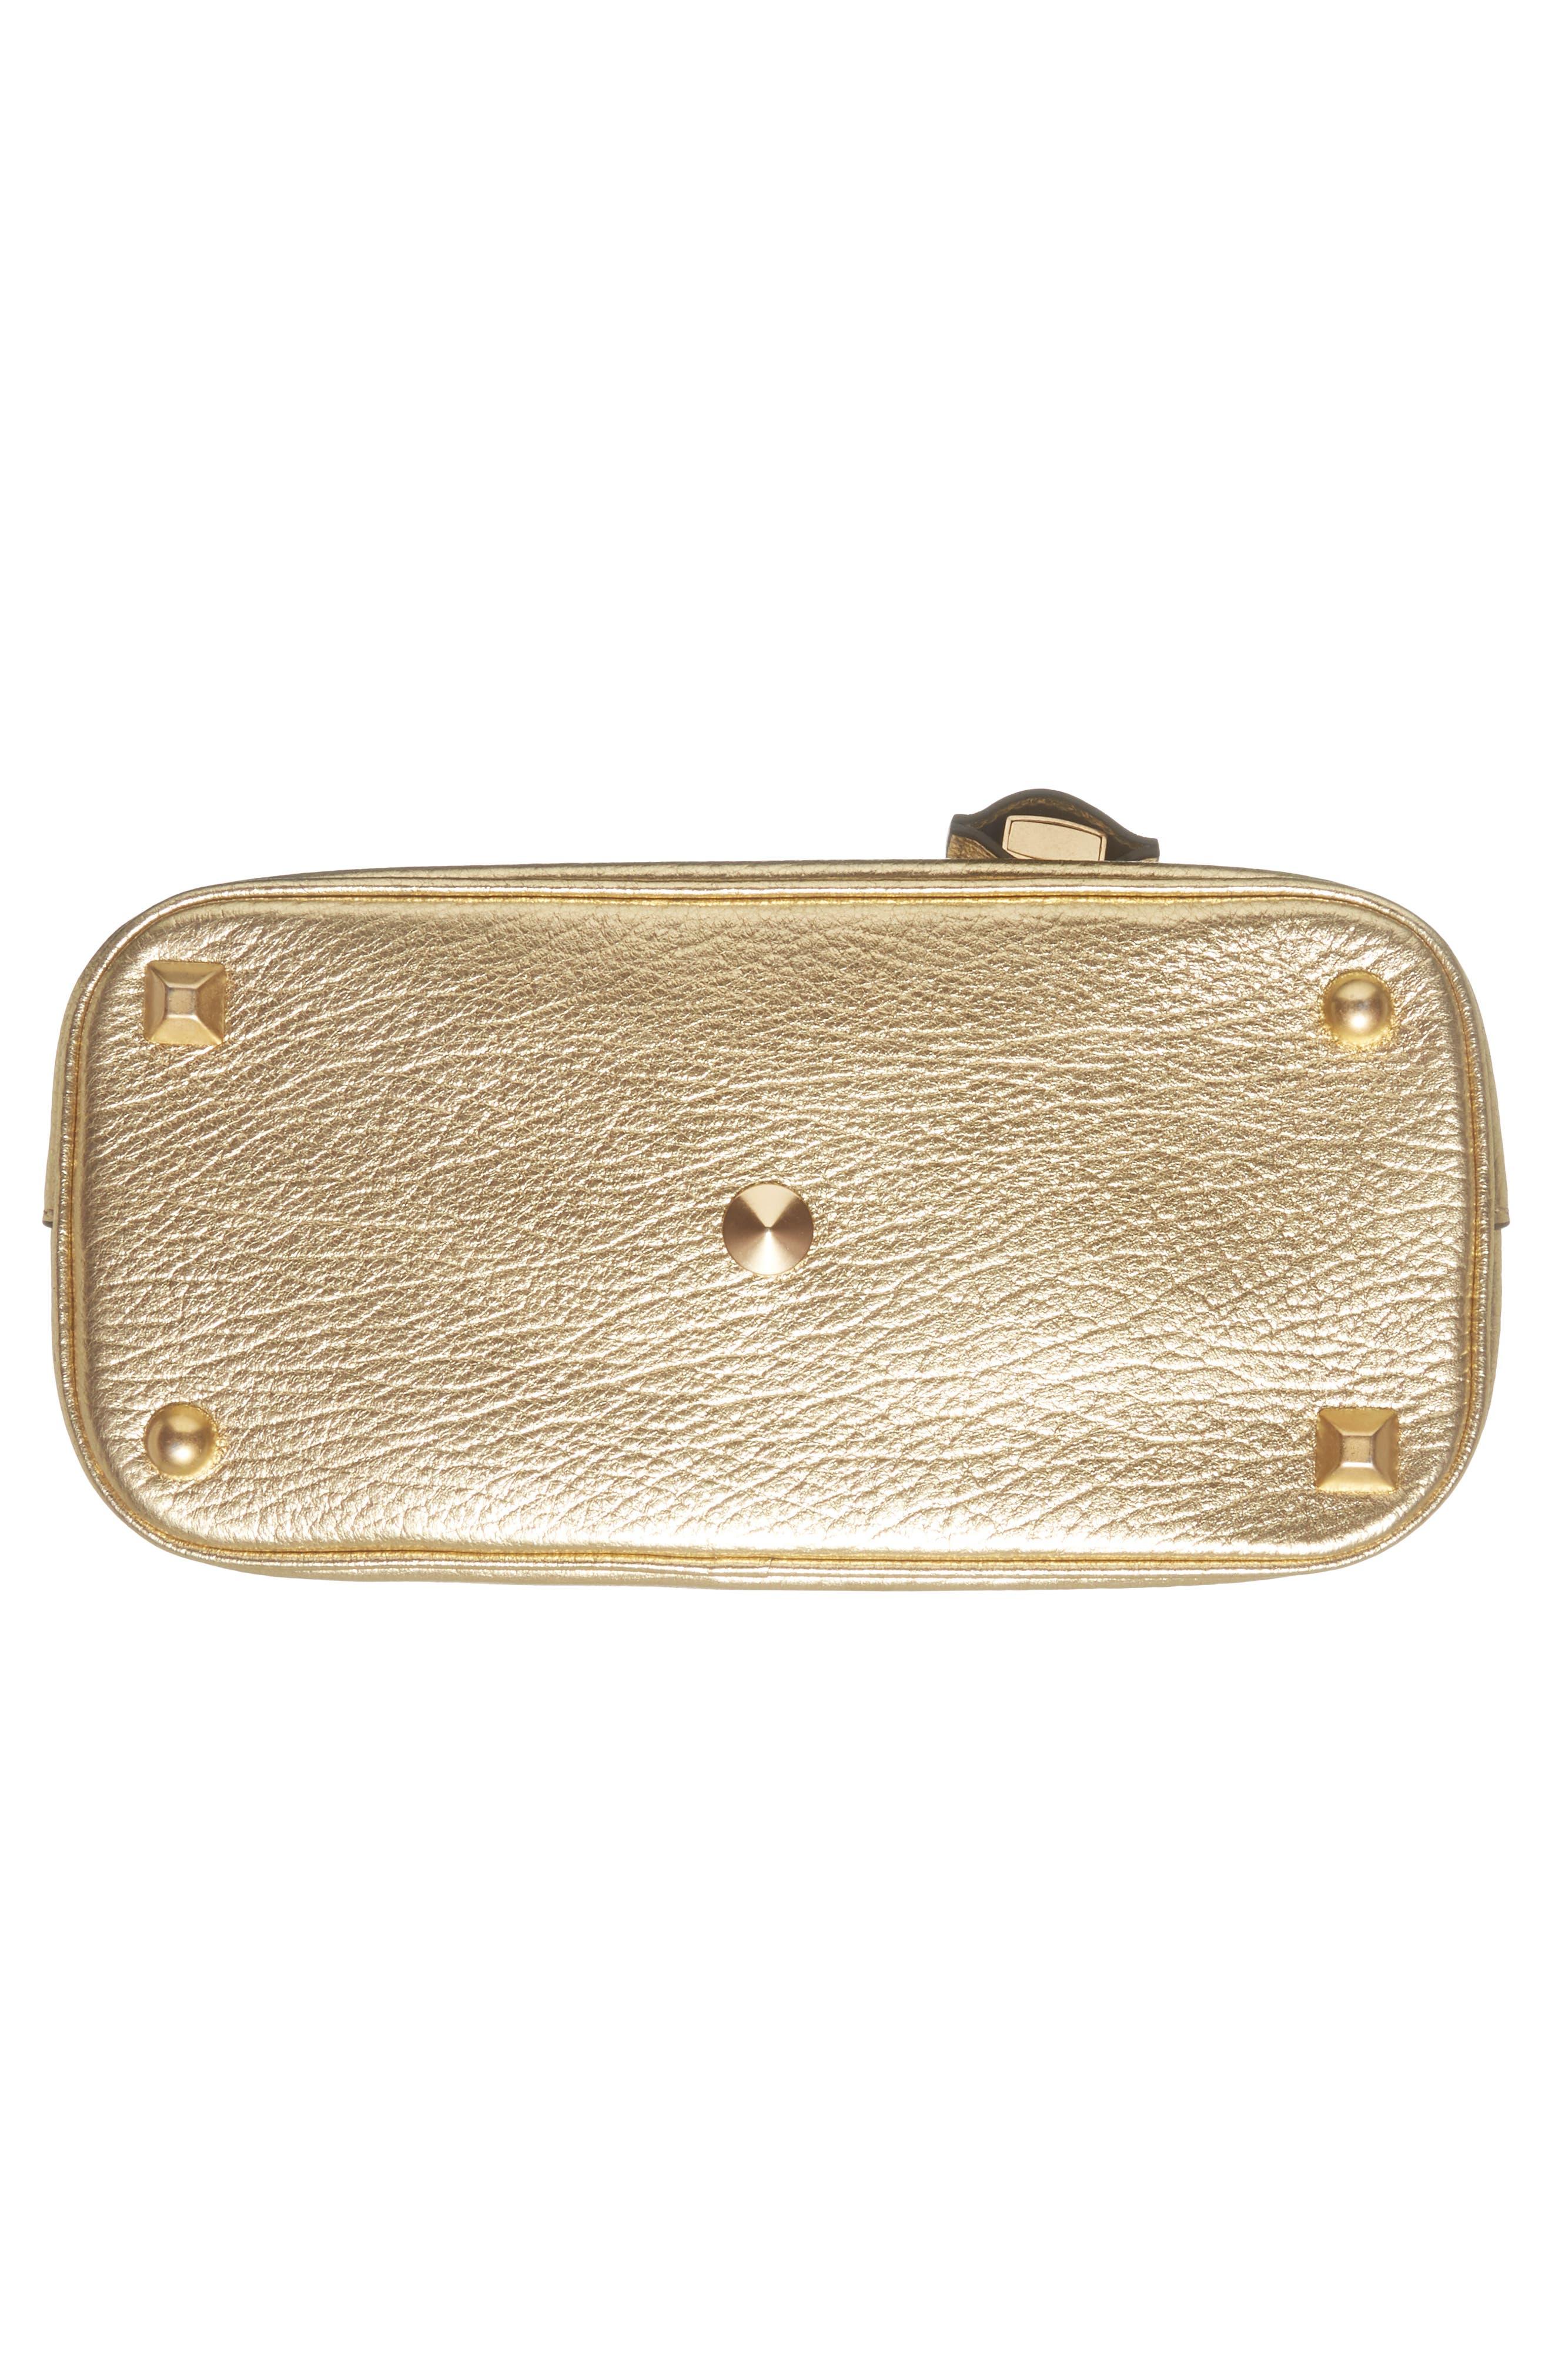 Small 5AC Calfskin Leather Handbag,                             Alternate thumbnail 6, color,                             Gold